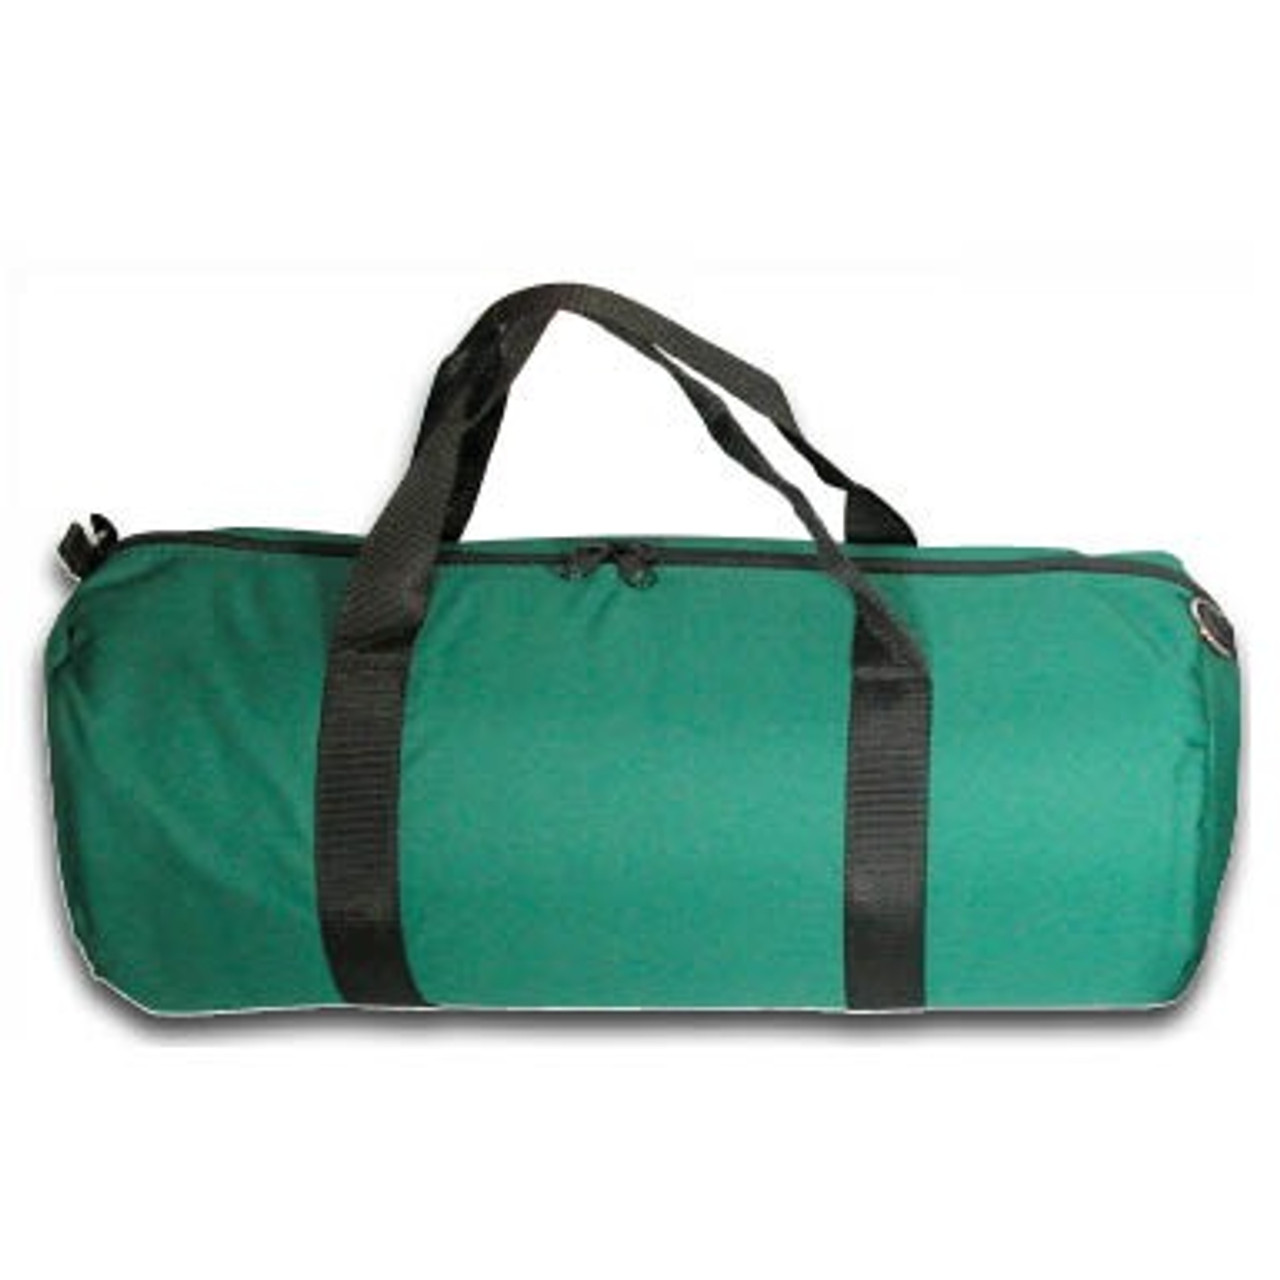 Green Basic Oxygen Duffle - Made in USA